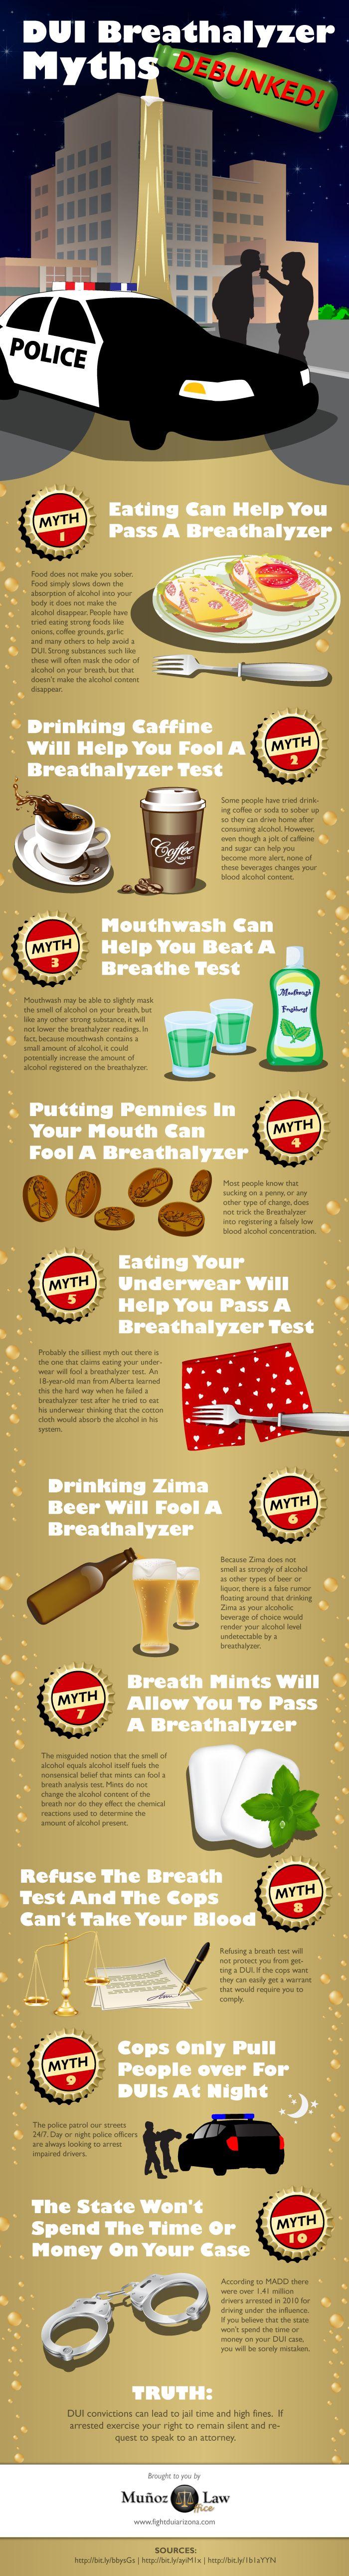 DUI Breathalyzer myths : Myth Buster Infographic debunks myths of Breathalyzer test of Driving Under Influence.